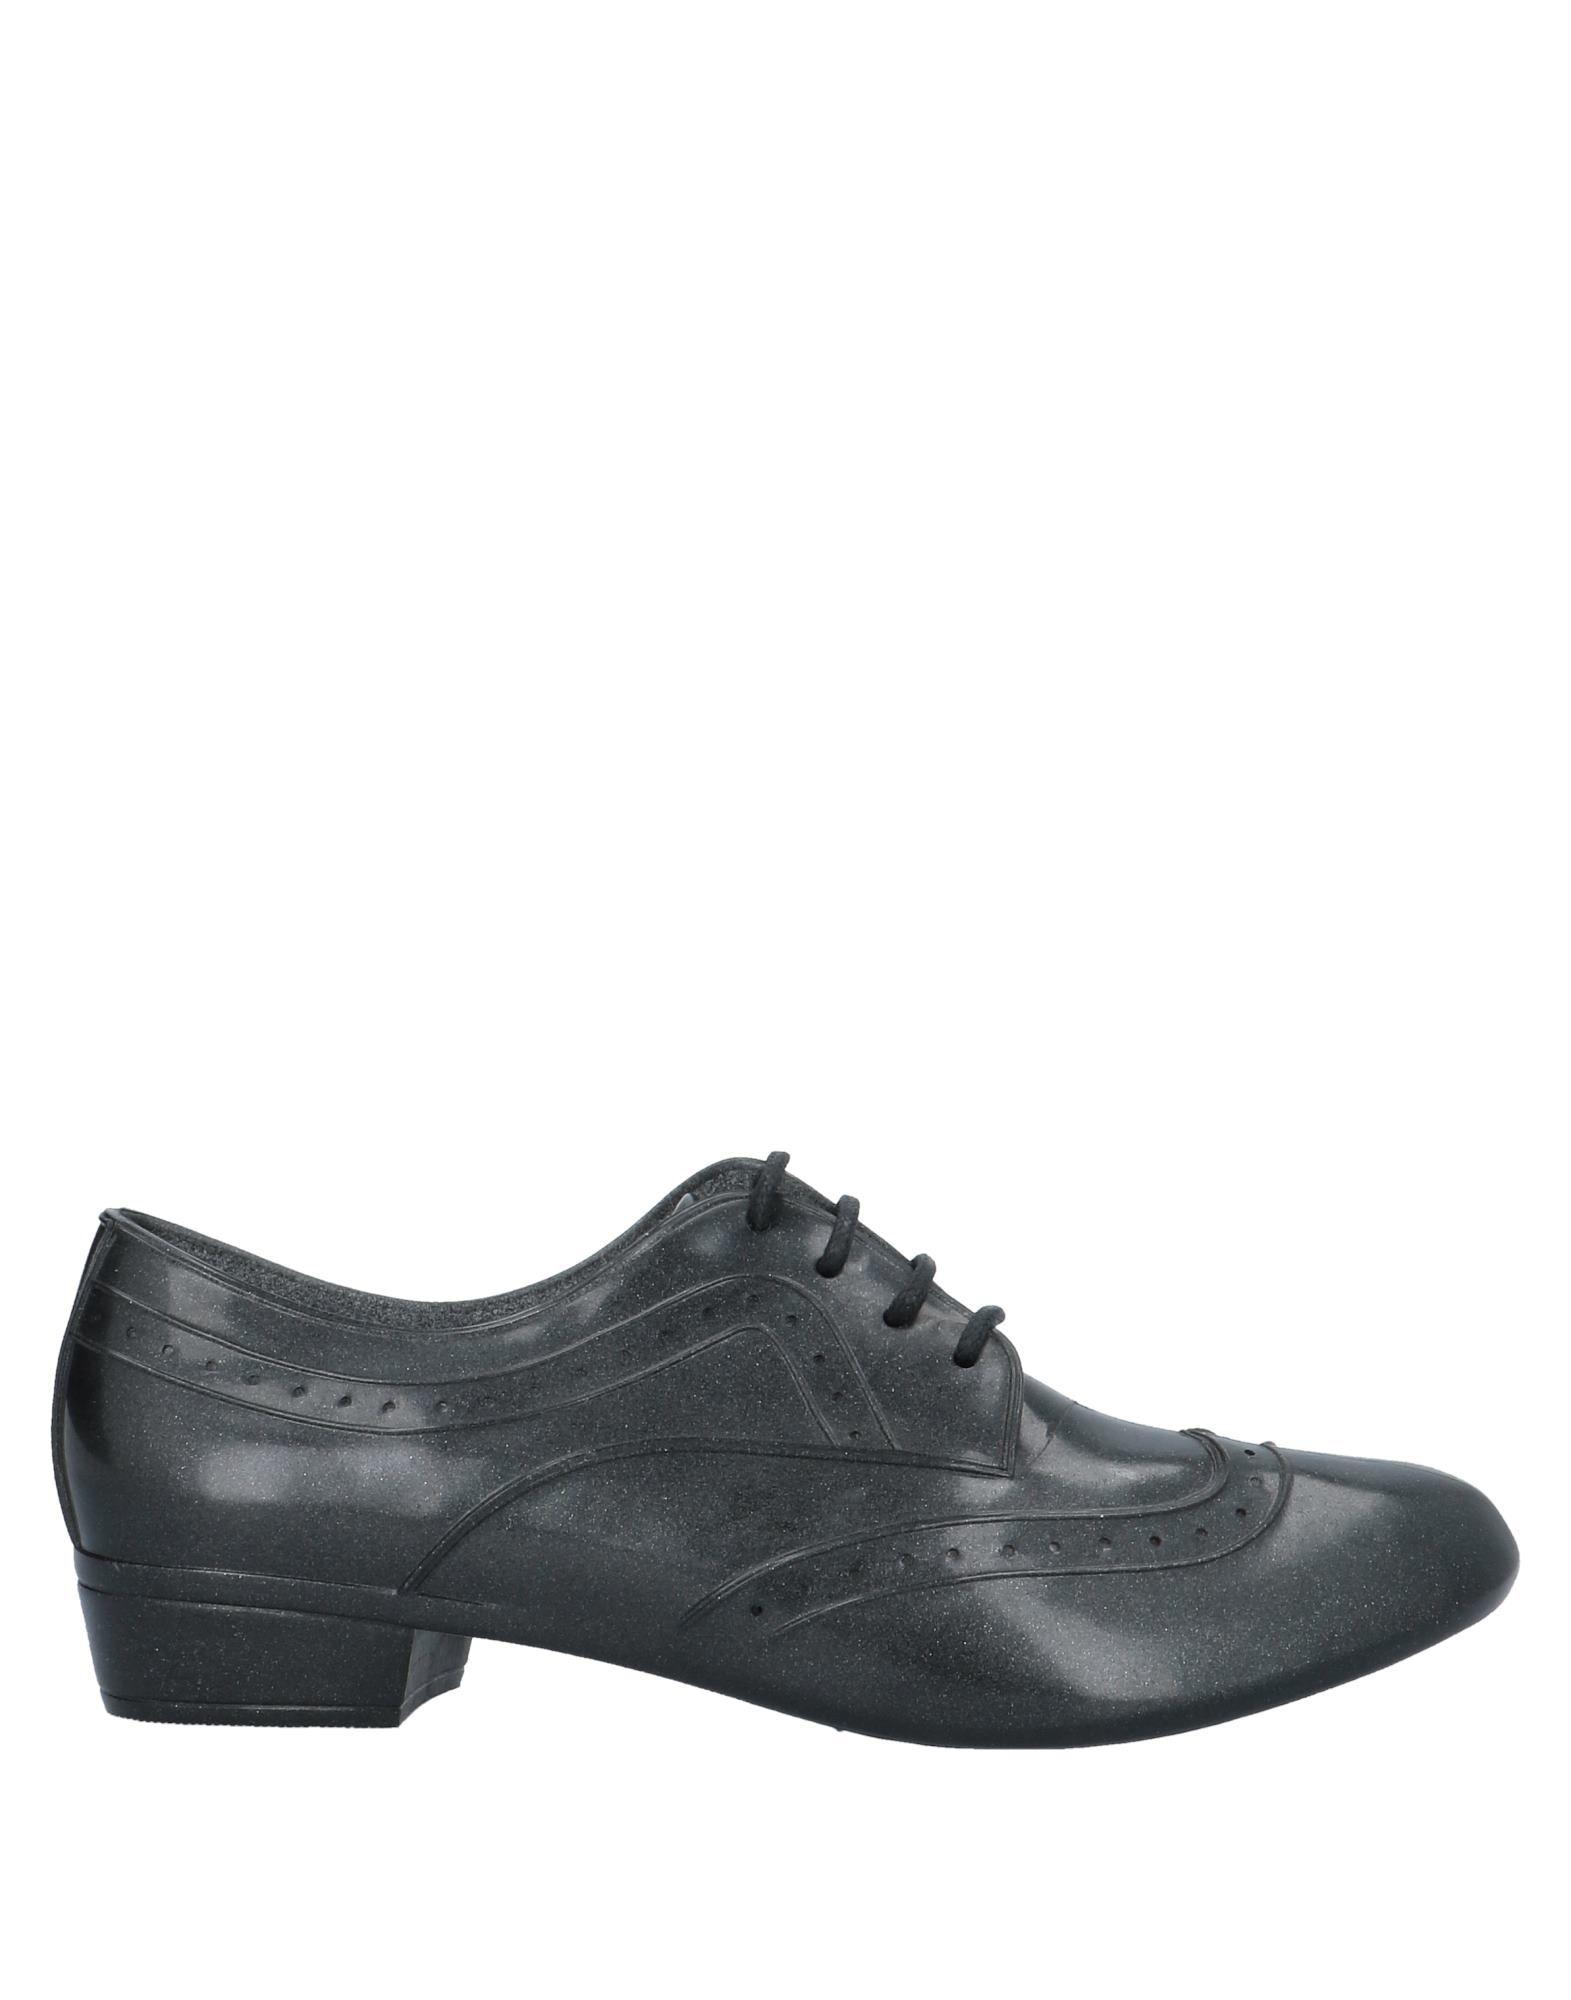 MELISSA + ALEXANDRE HERCHCOVITCH Обувь на шнурках melissa alexandre herchcovitch сандалии